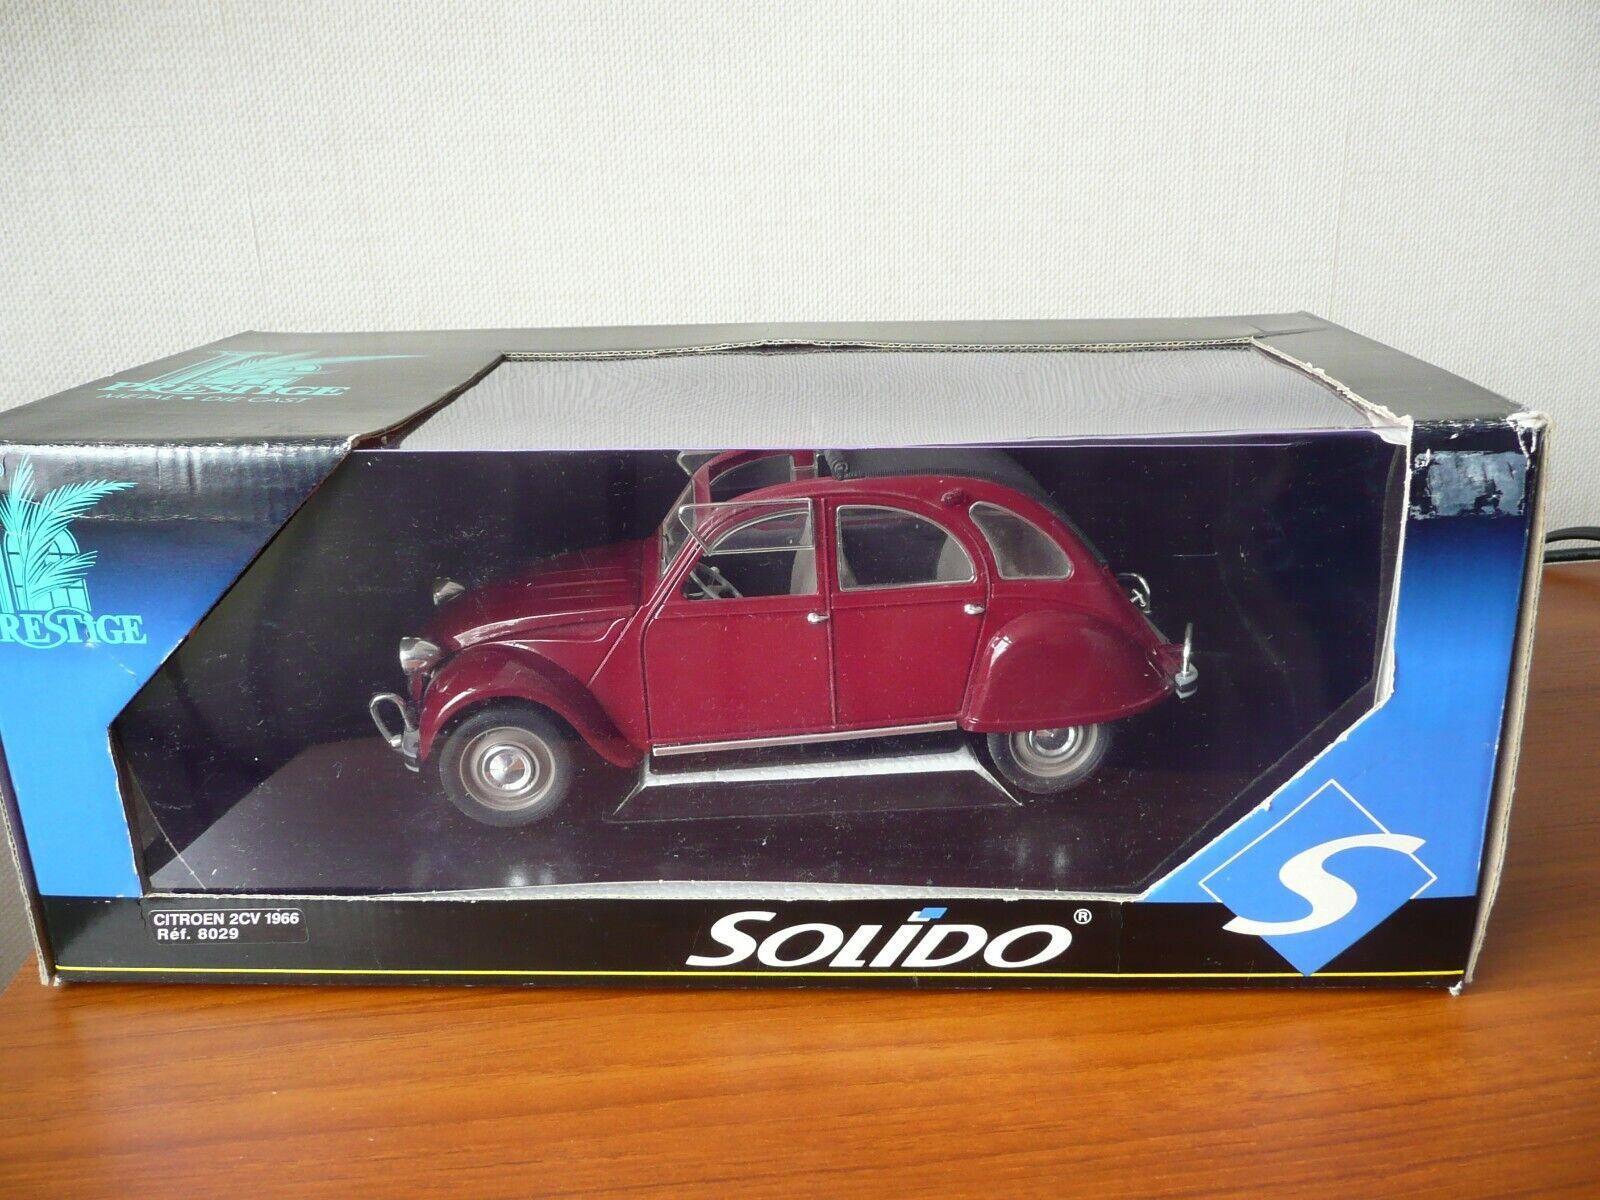 SOLIDO PRESTIGE 1966 CITROEN 2CV - 1 18